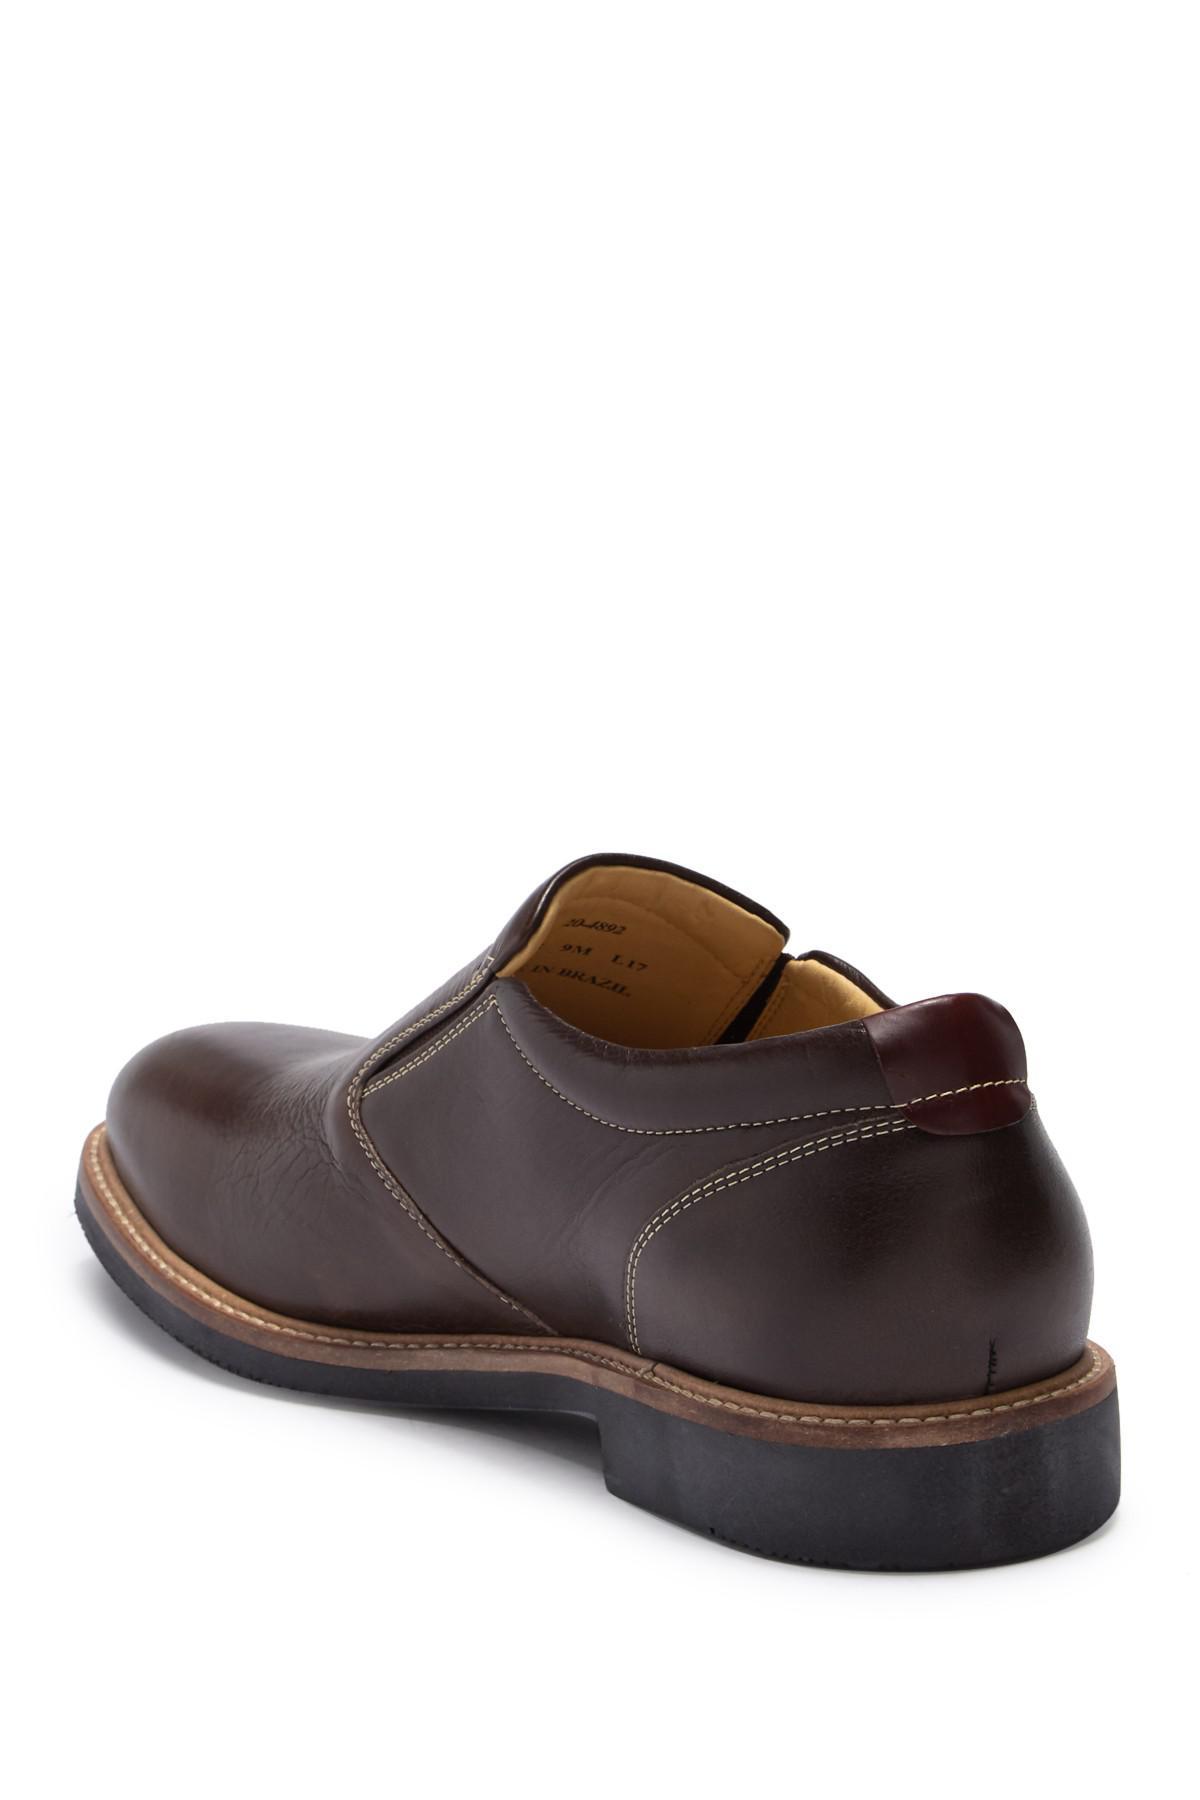 c039f85a6e0 Lyst - Johnston   Murphy Barlow Leather Slip-on Loafer - Wide Width ...